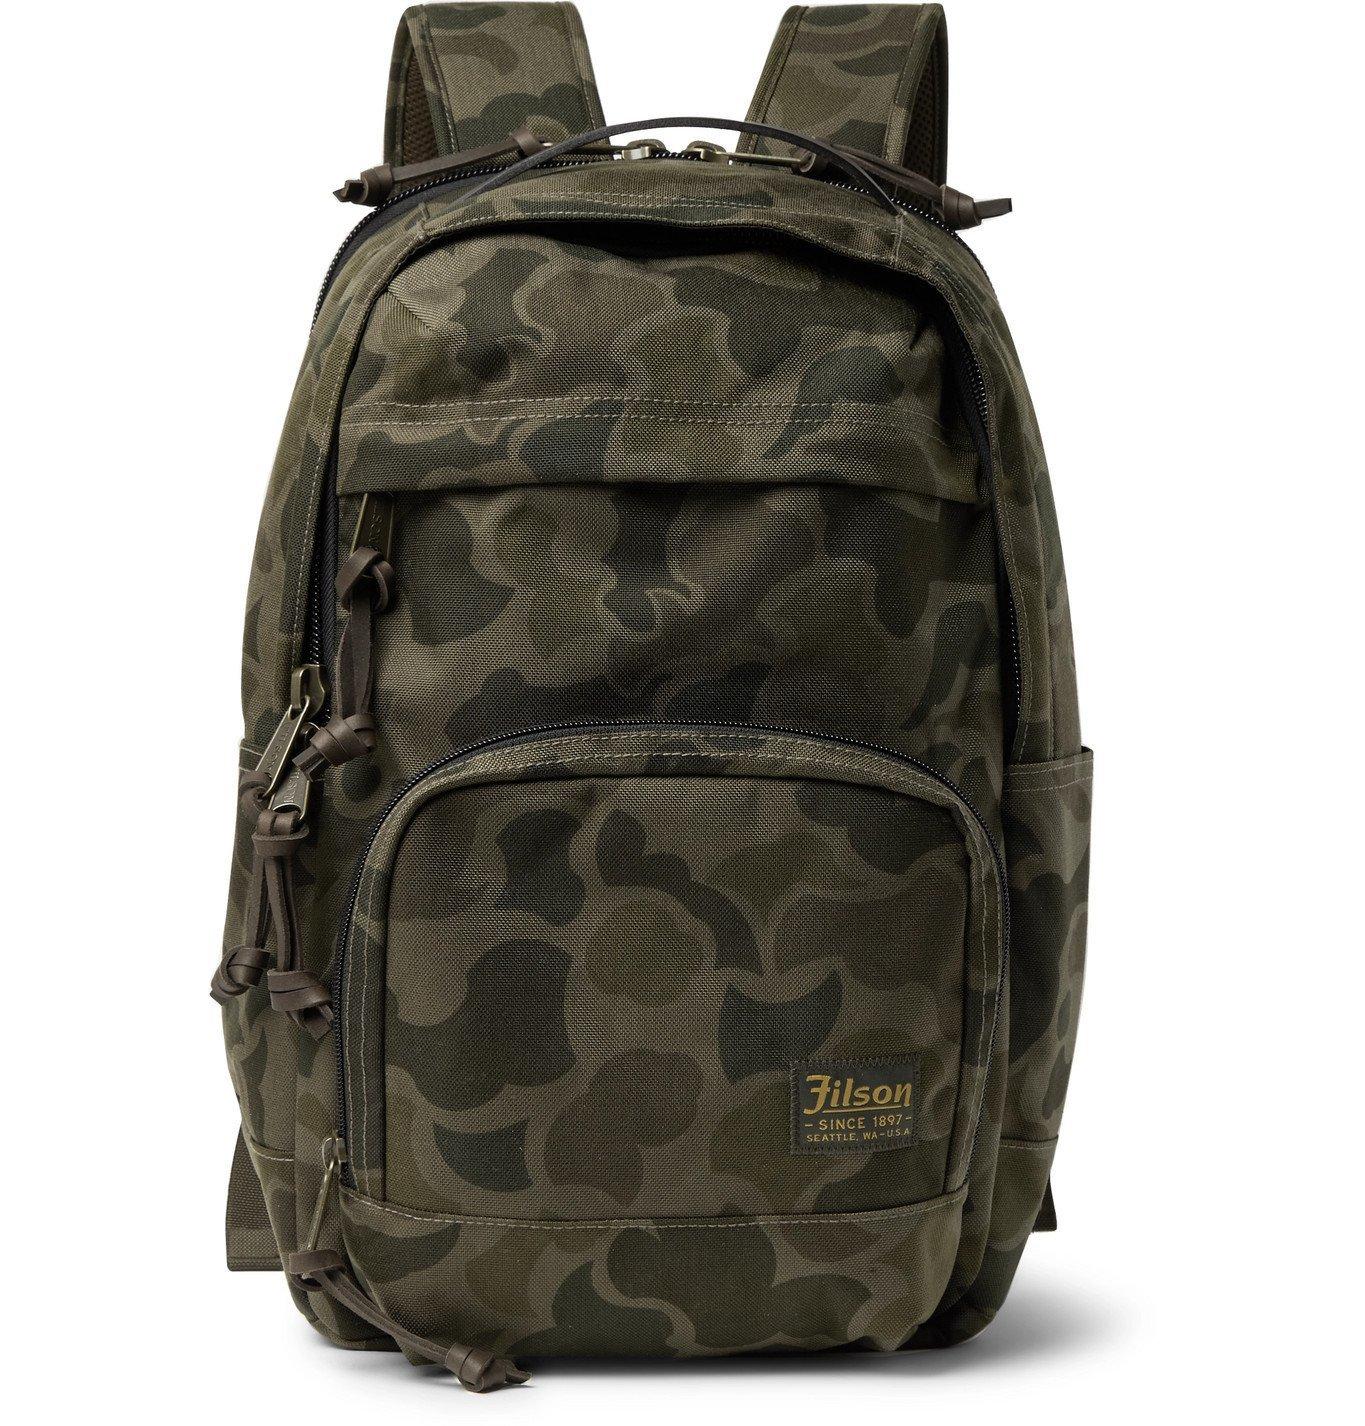 Filson - Dryden Leather-Trimmed CORDURA Backpack - Green